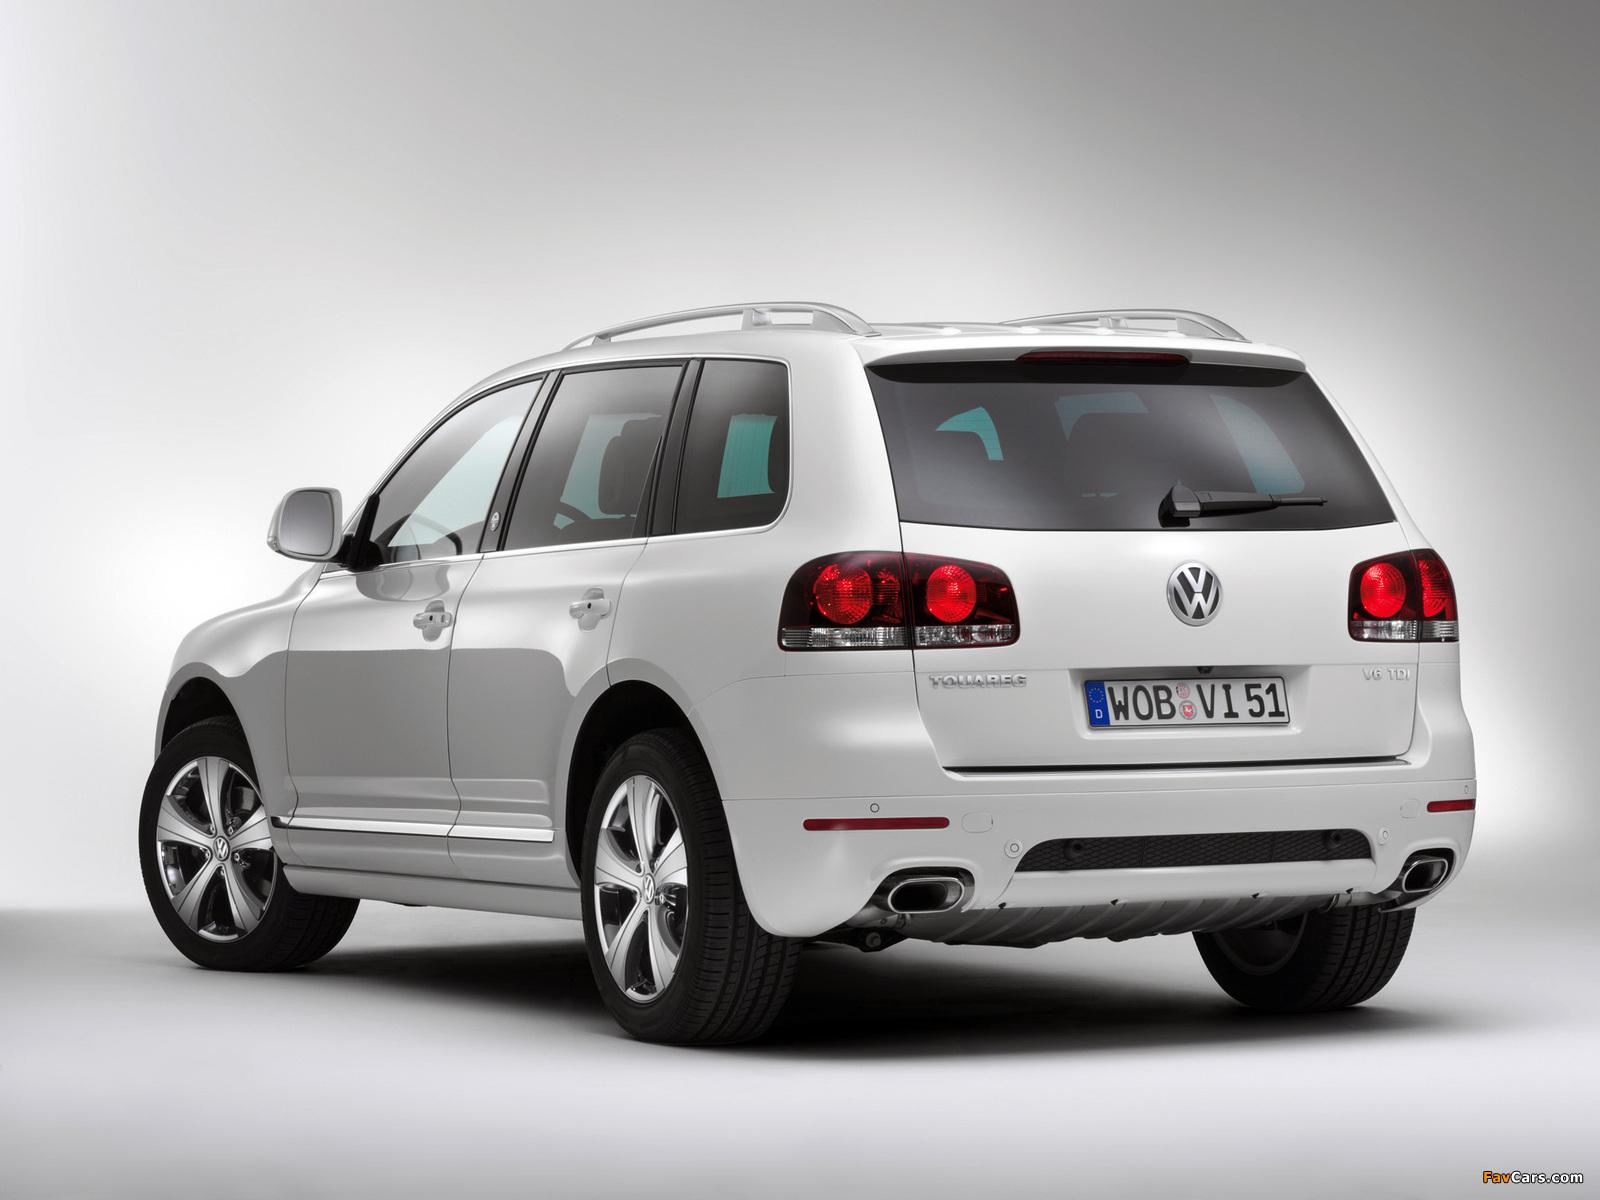 Volkswagen Touareg V6 TDI North Sails 2008 wallpapers (1600 x 1200)